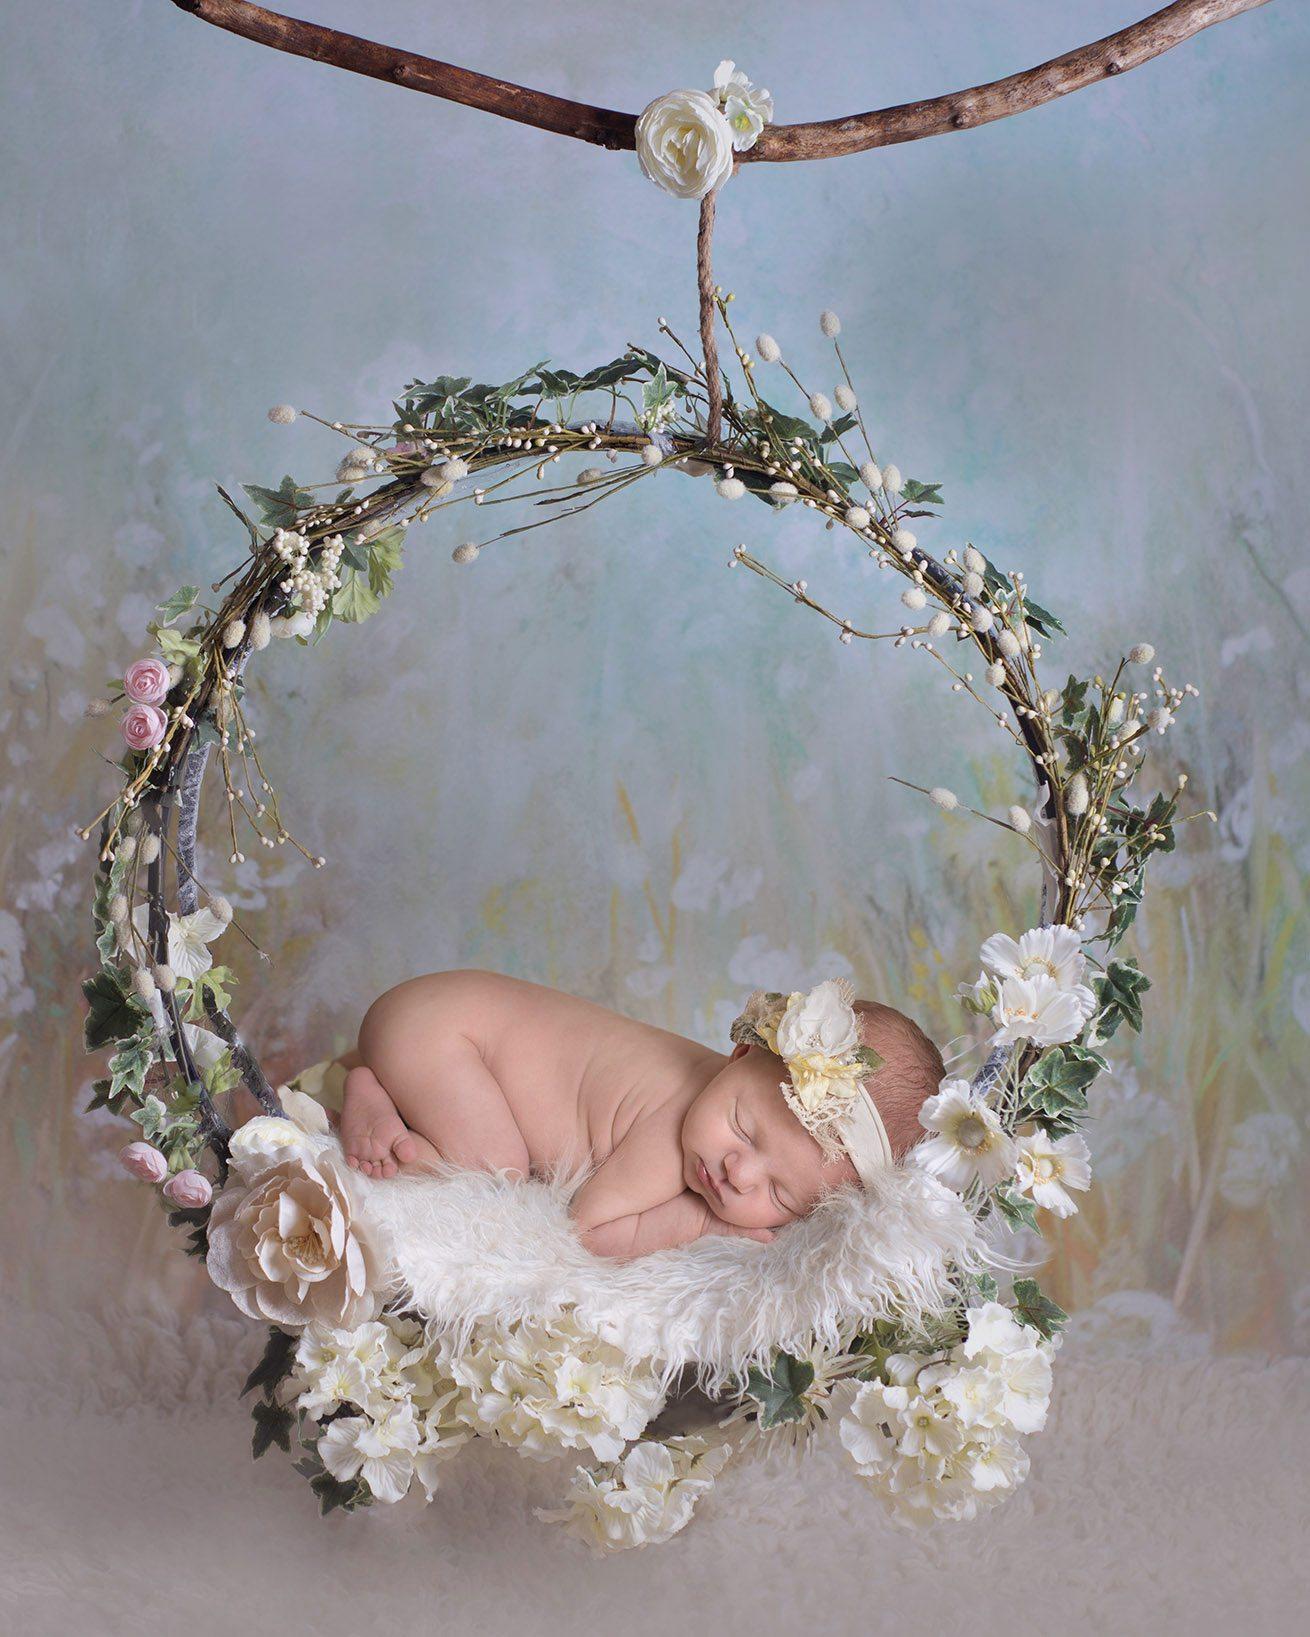 Safe baby composite newborn baby girl wearing a flower headband on a flower hoop - Essex and Suffolk baby photographer.